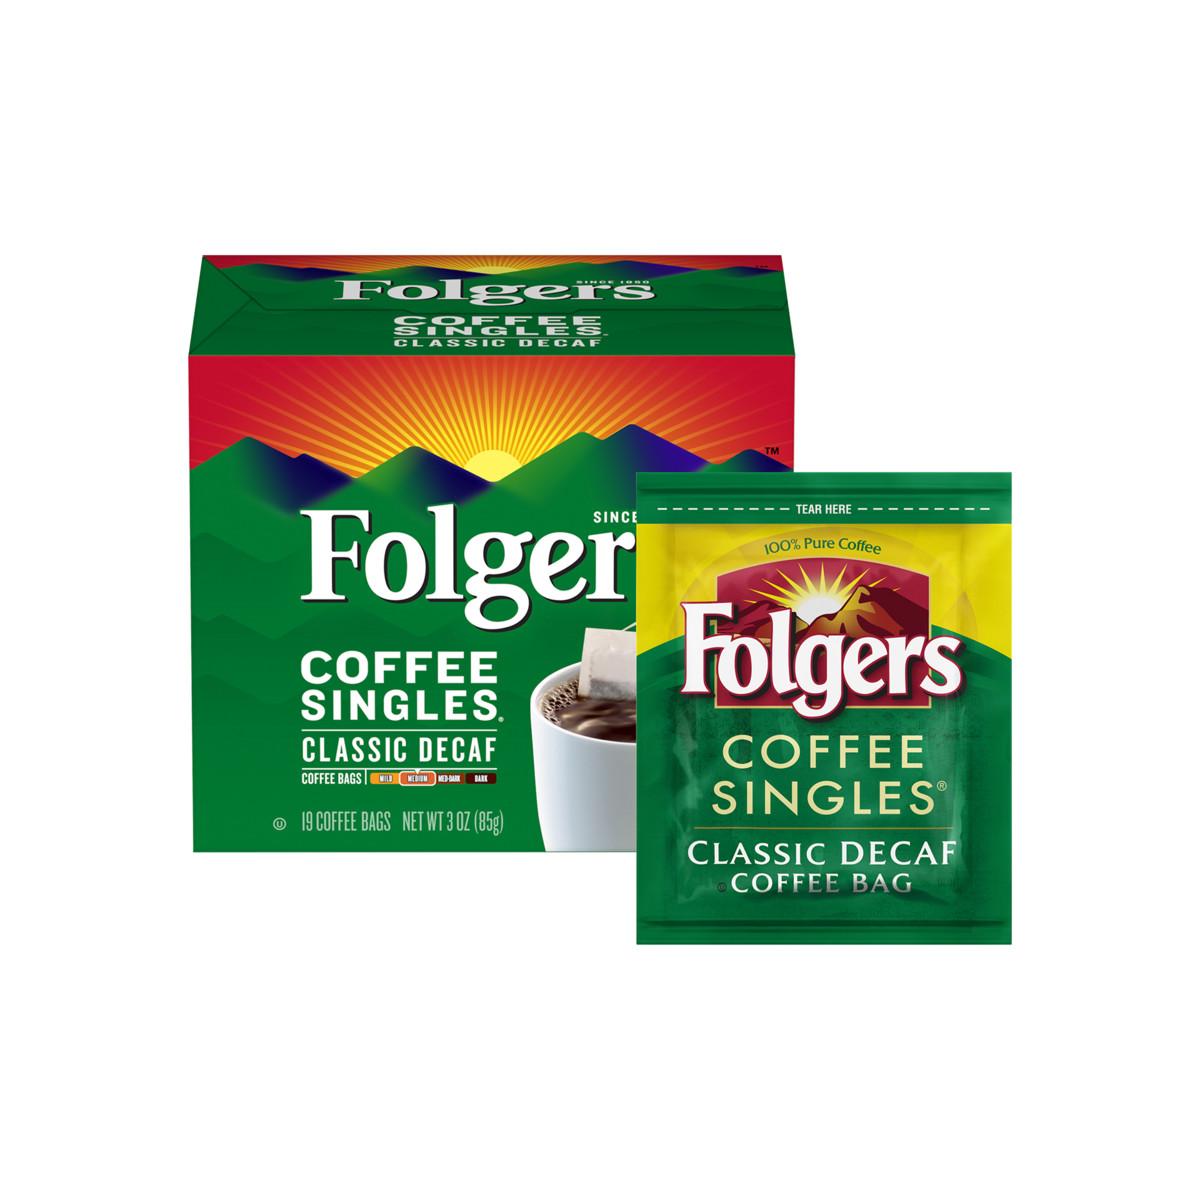 Classic Decaf Coffee Singles